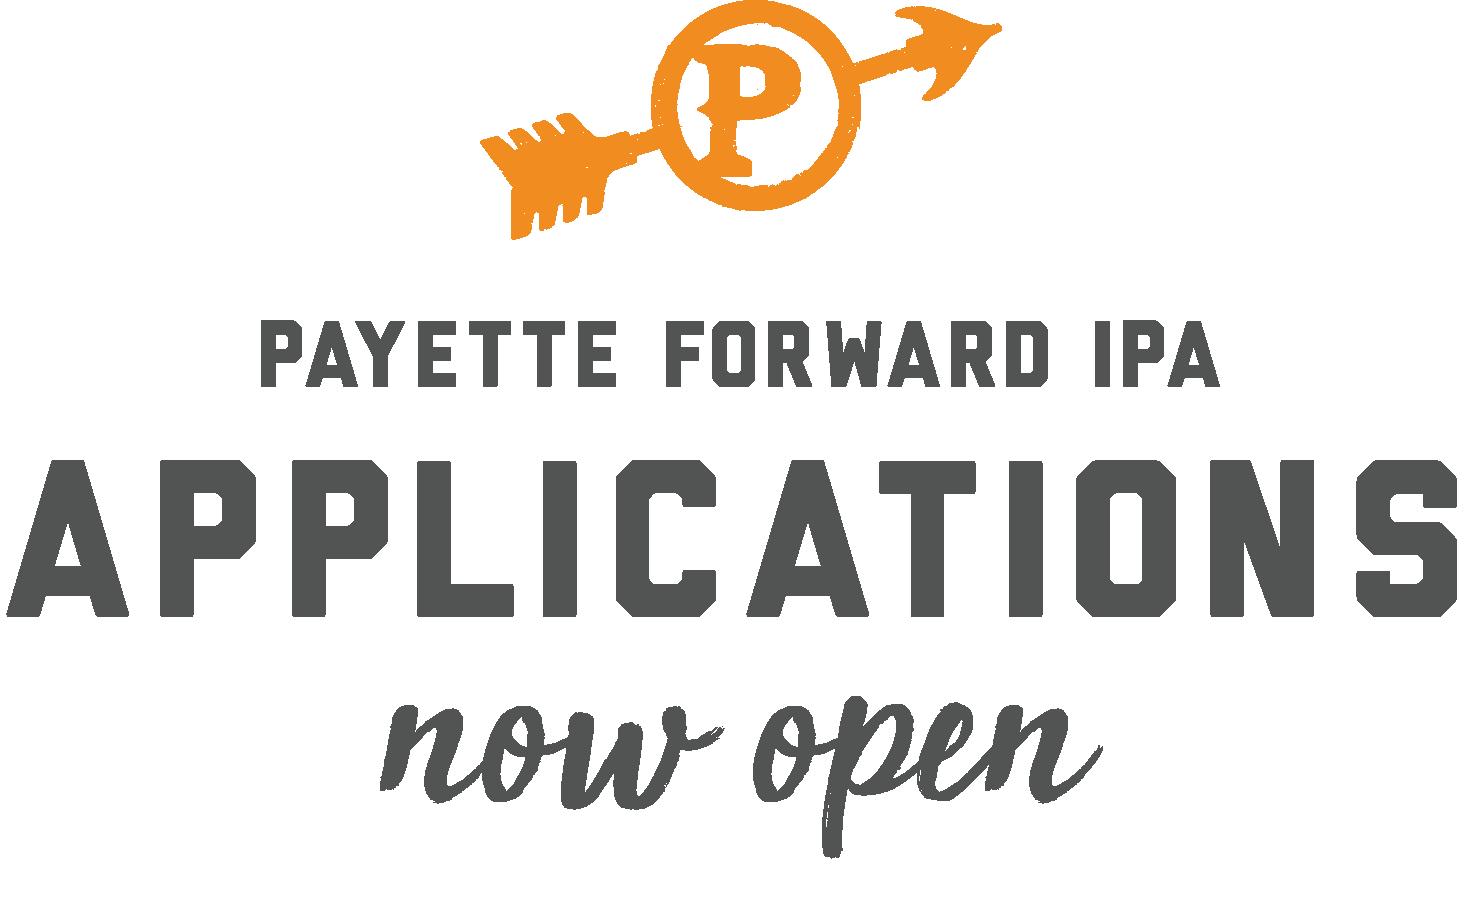 PayetteForward_AppsOpen.png